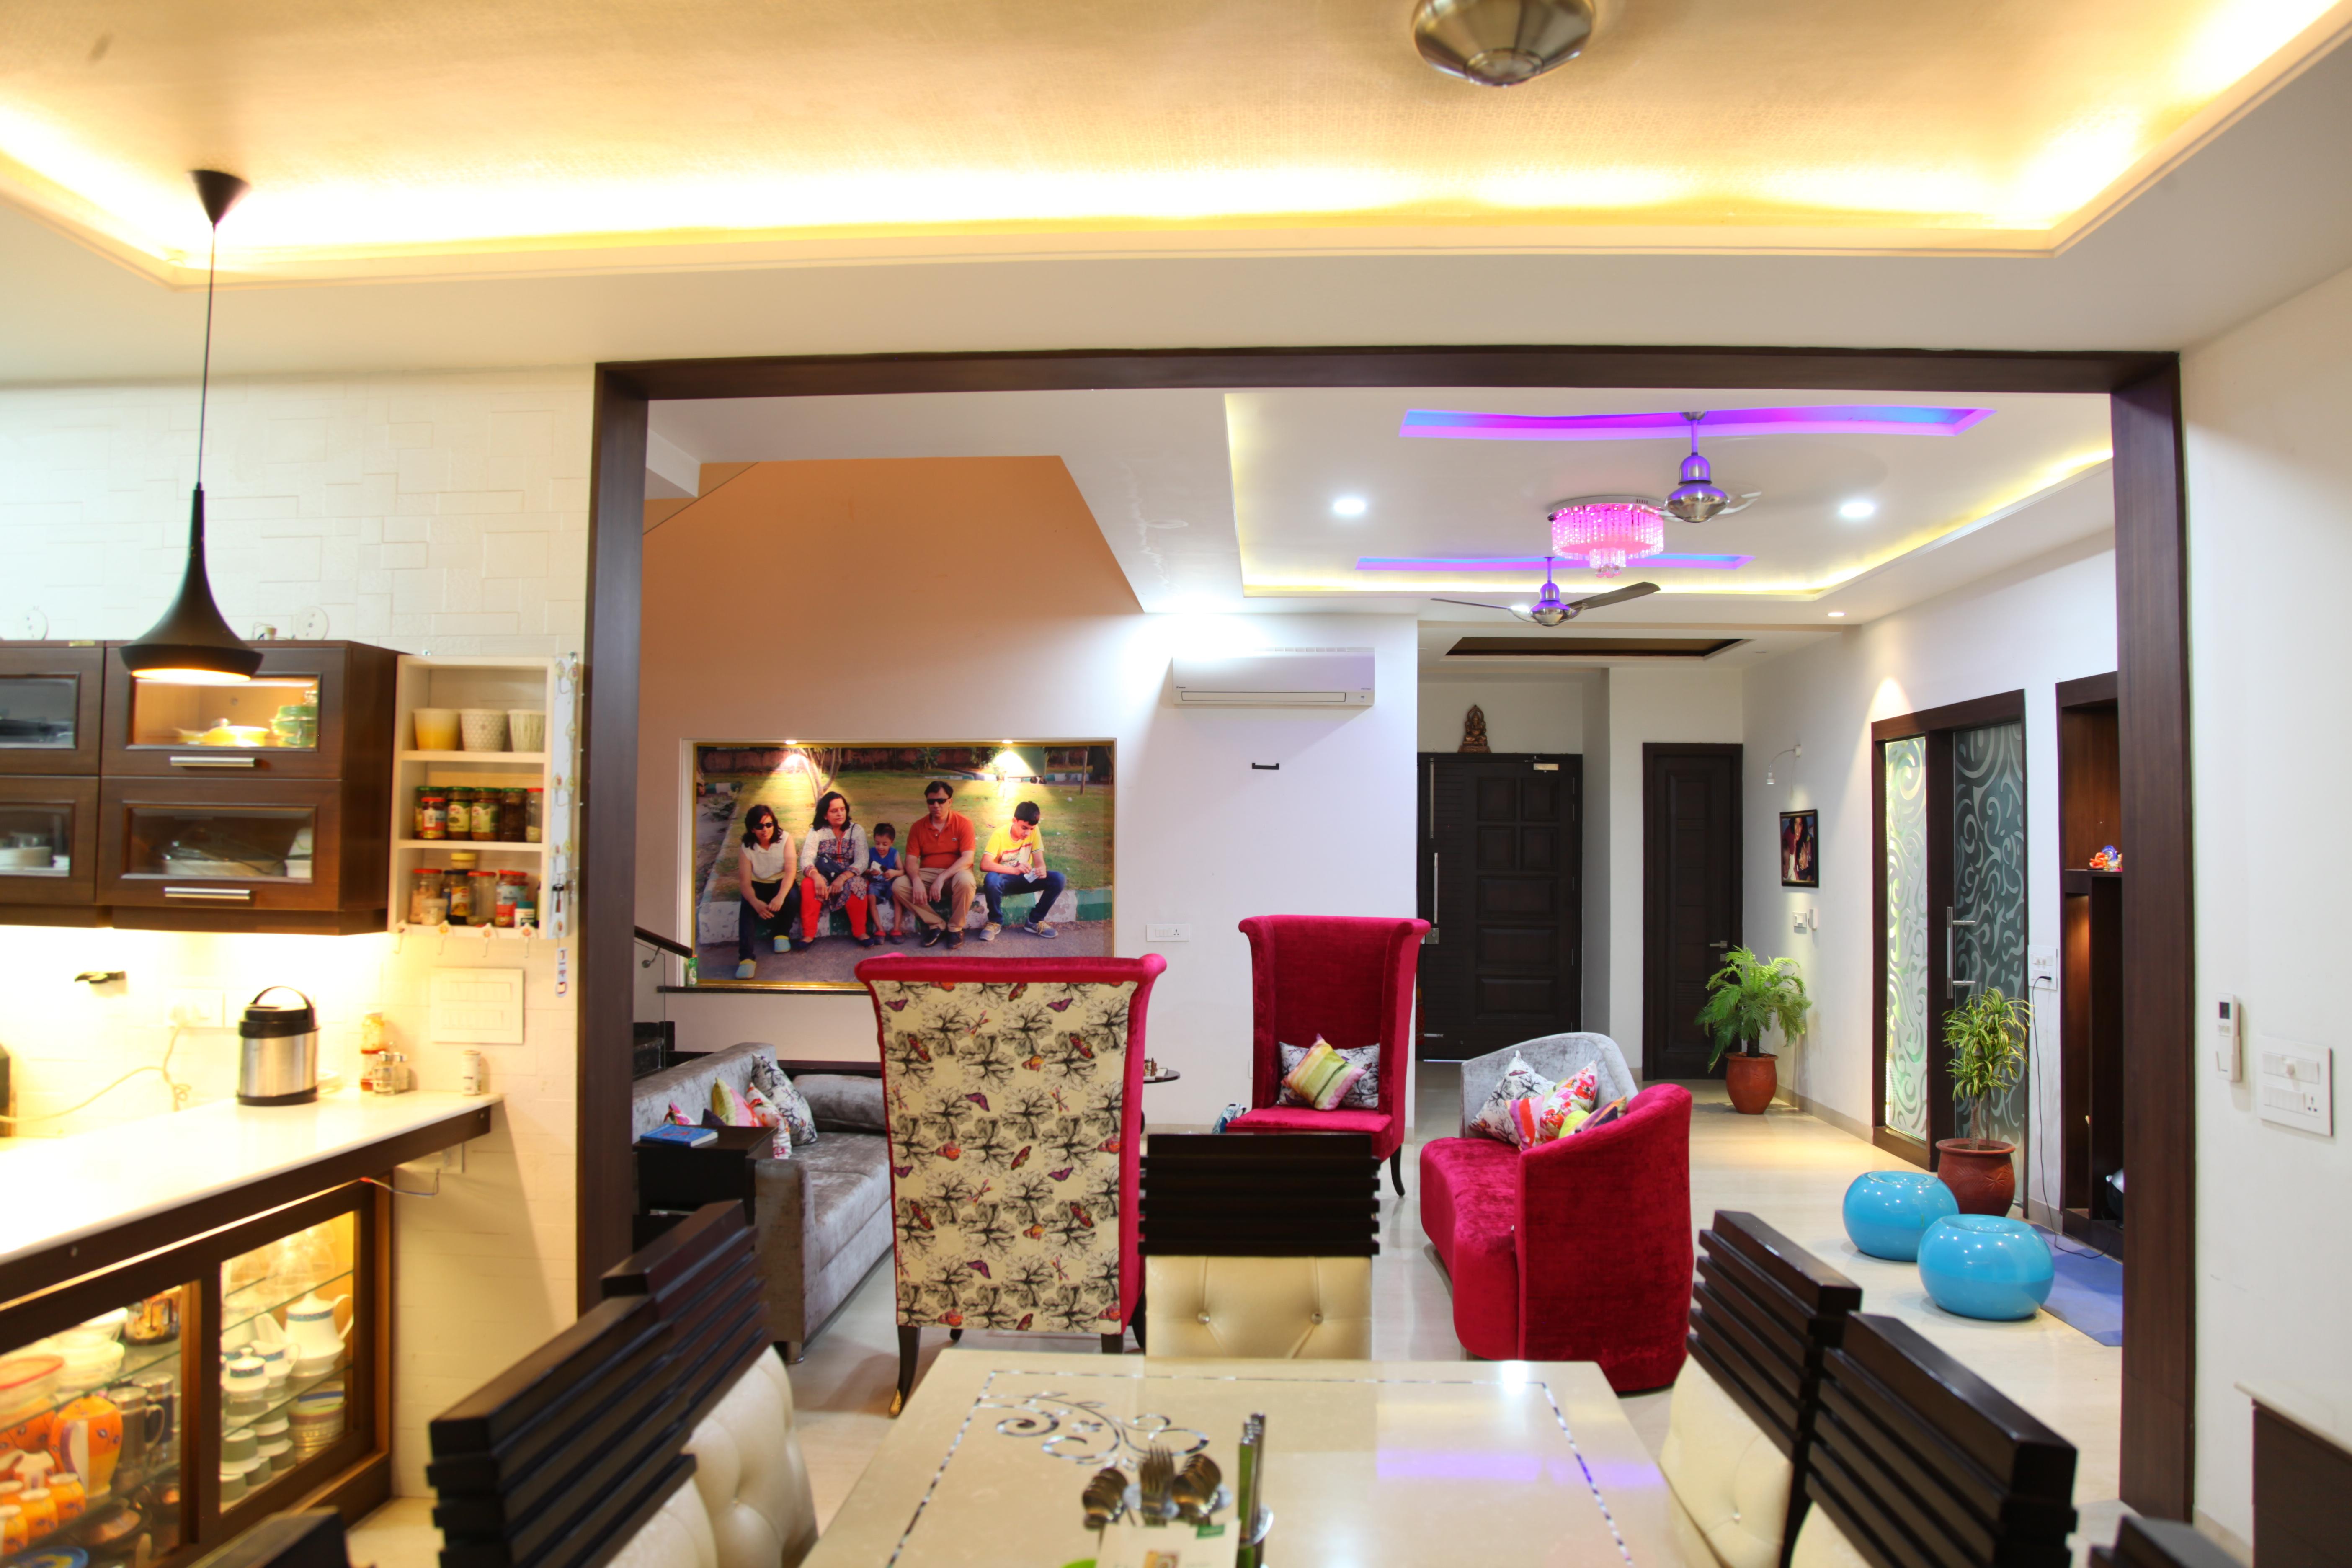 Lobby of beautiful home